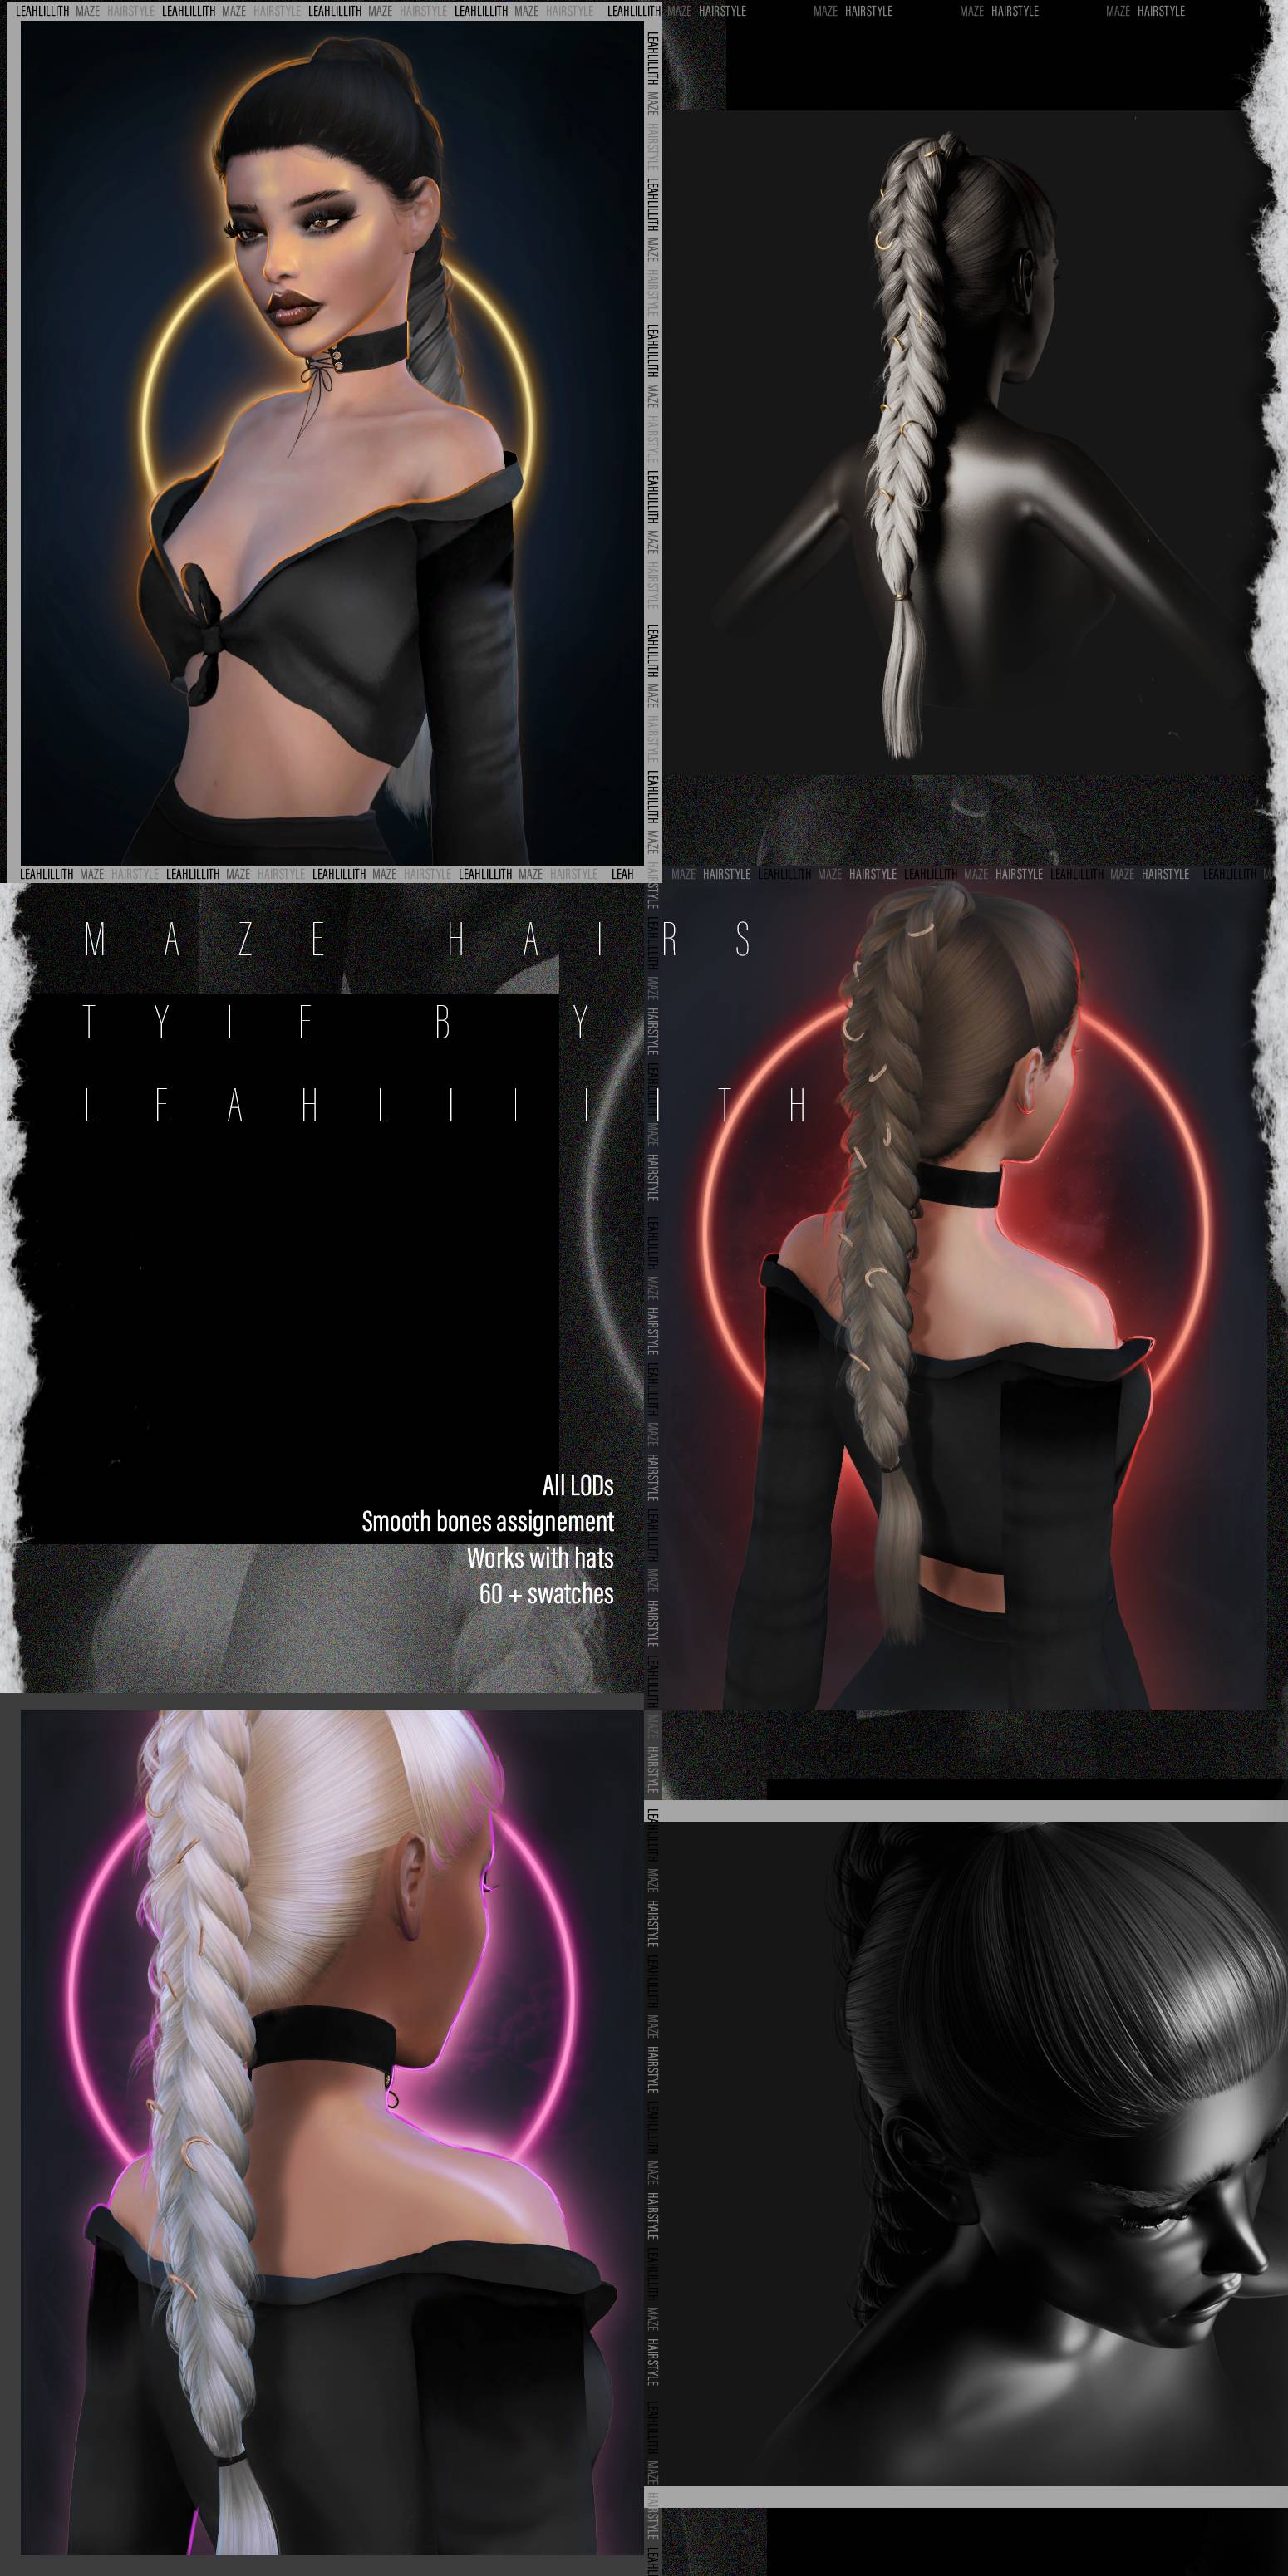 Женская прическа - Maze Hairstyle